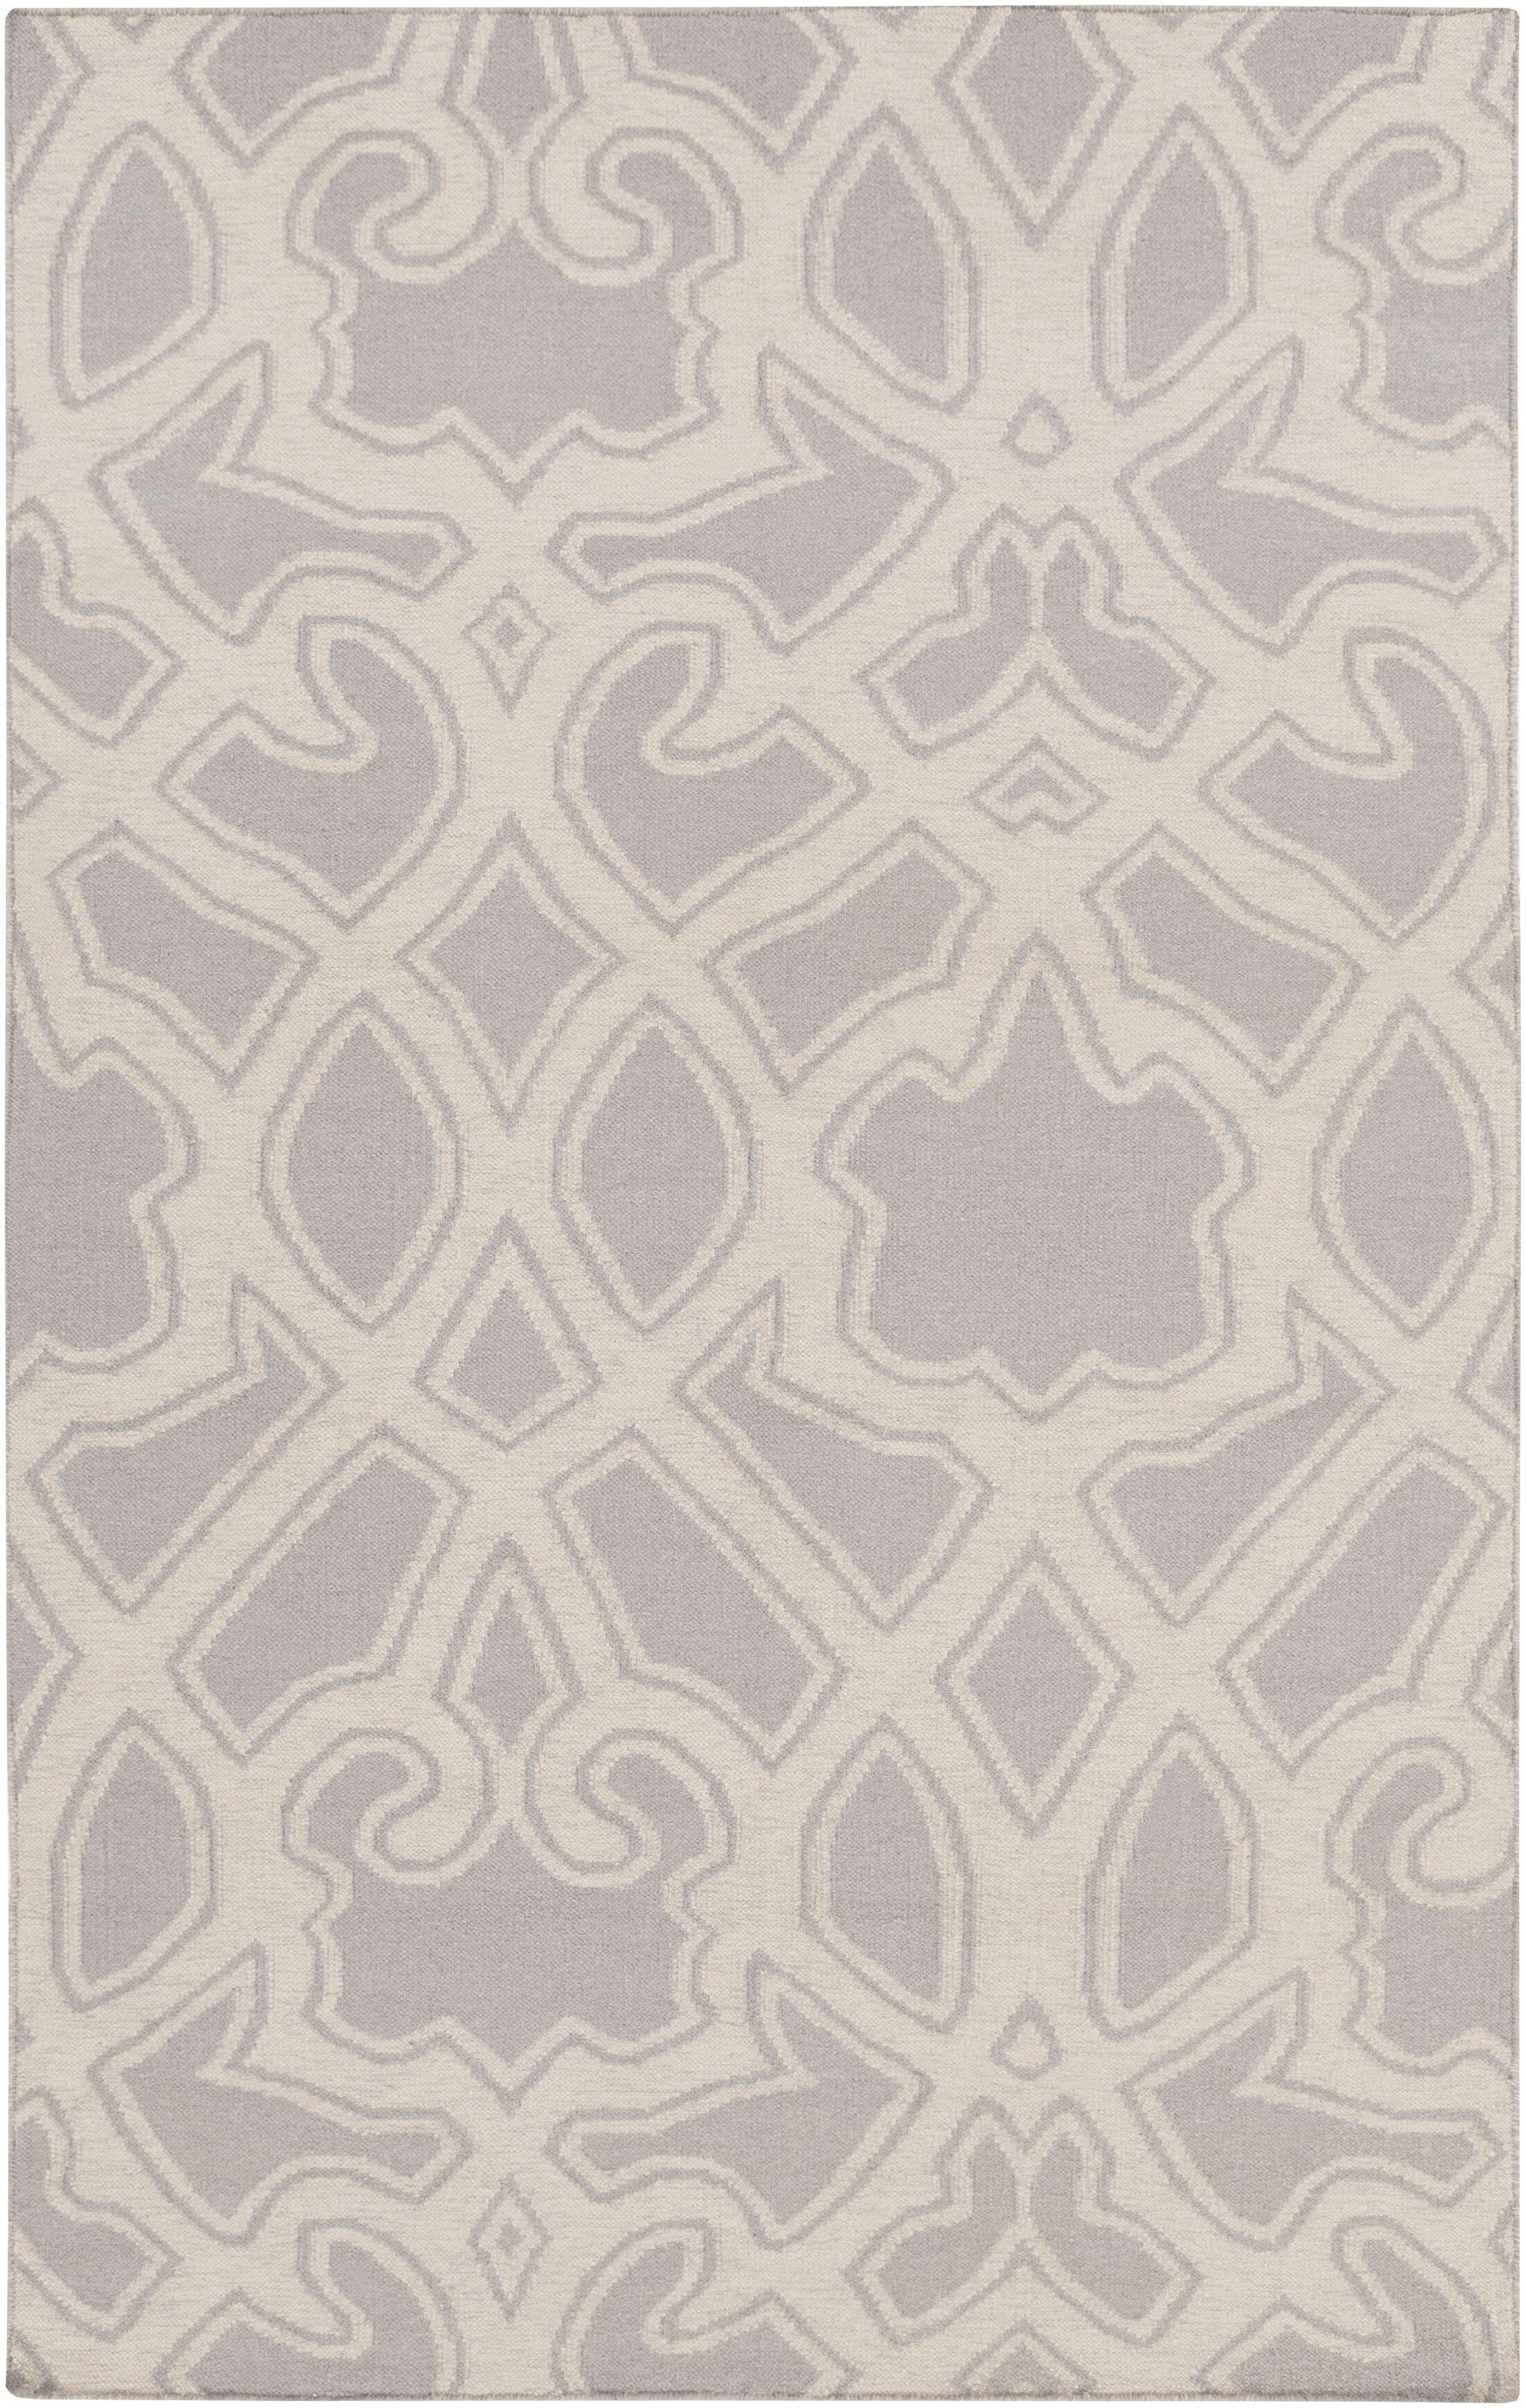 LaGrange Gray Area Rug Rug Size: Rectangle 8' x 11'